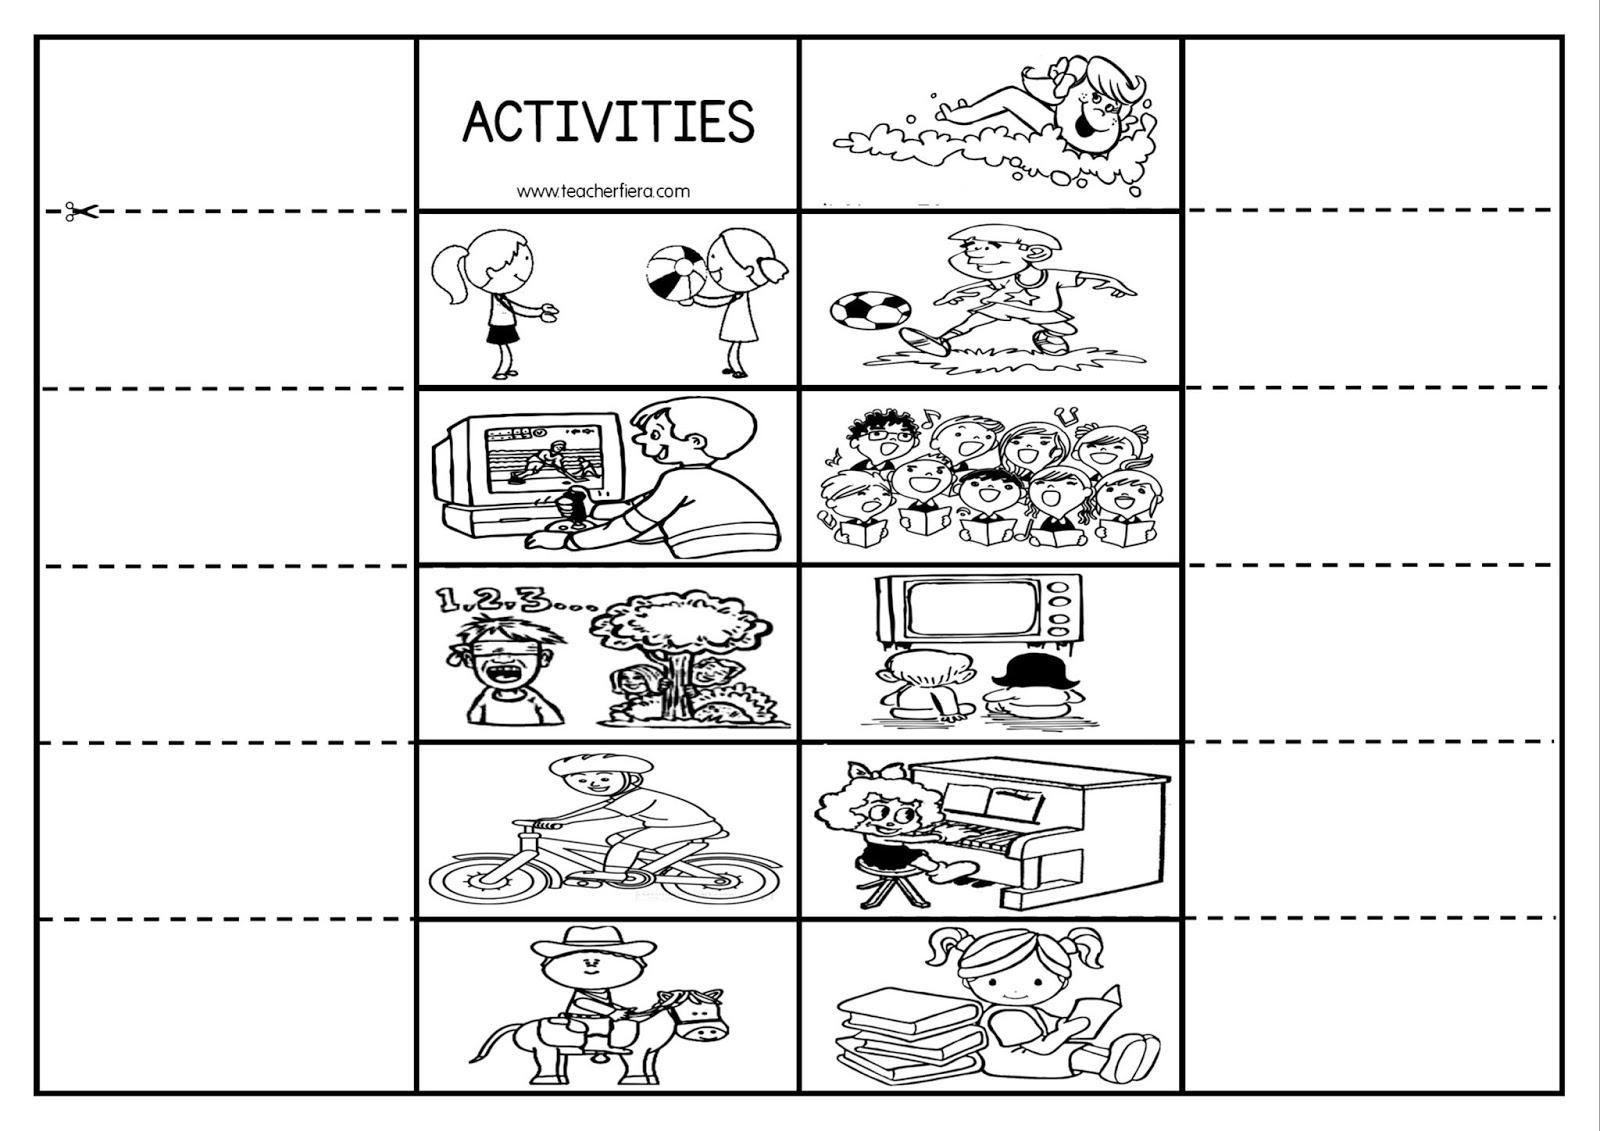 Teacherfiera Year 2 Unit 5 My Free Time Activities Gallery Walk Amp Flipbook Activity